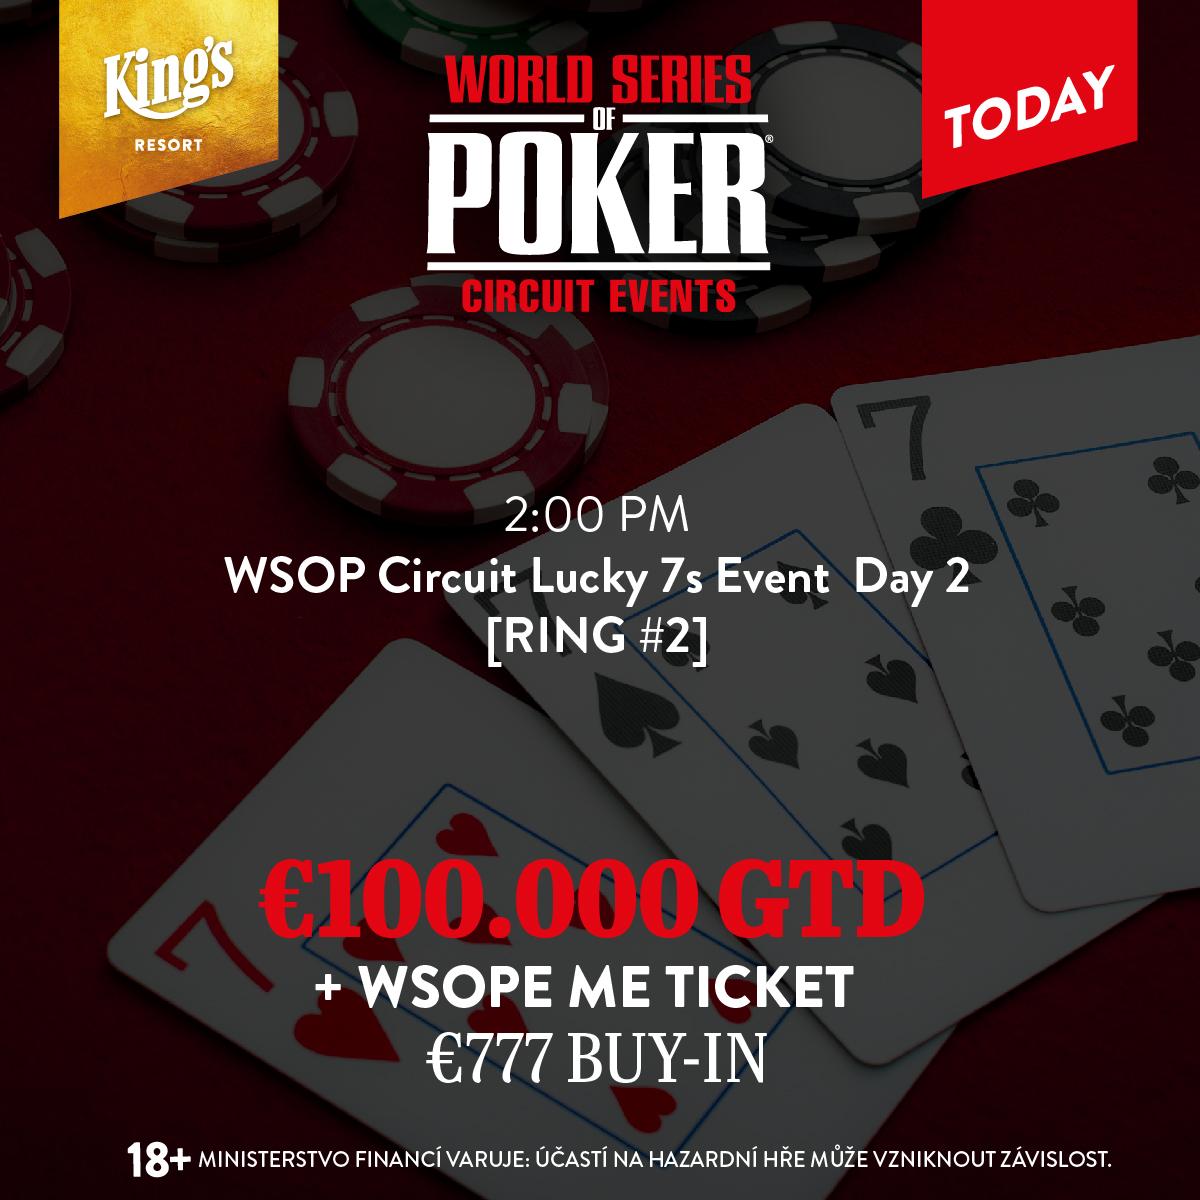 19.3.WSPC Luckys Seven Day 2-02